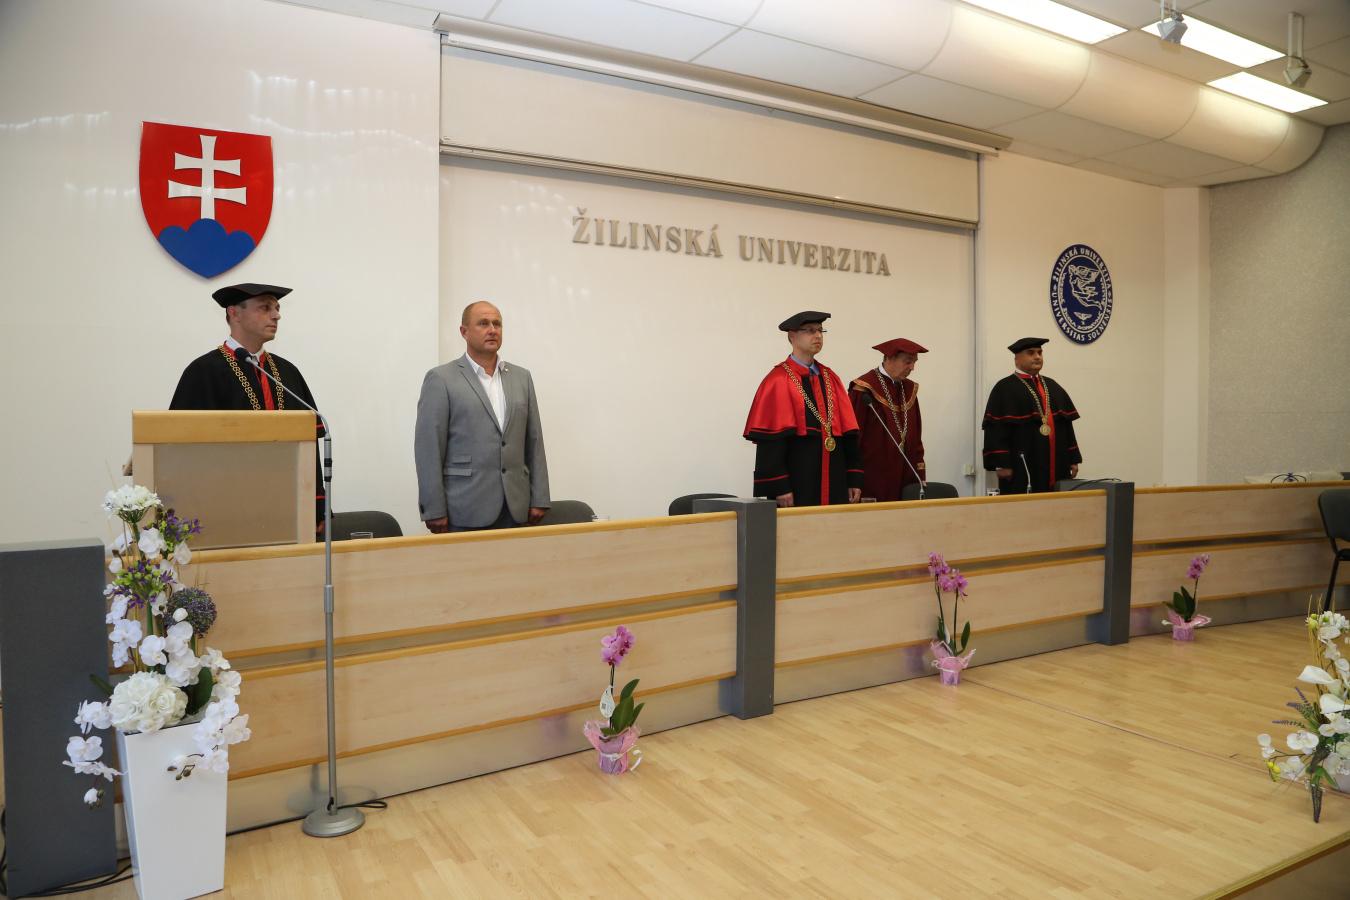 , Radnica mesta podporila detskú univerzitu